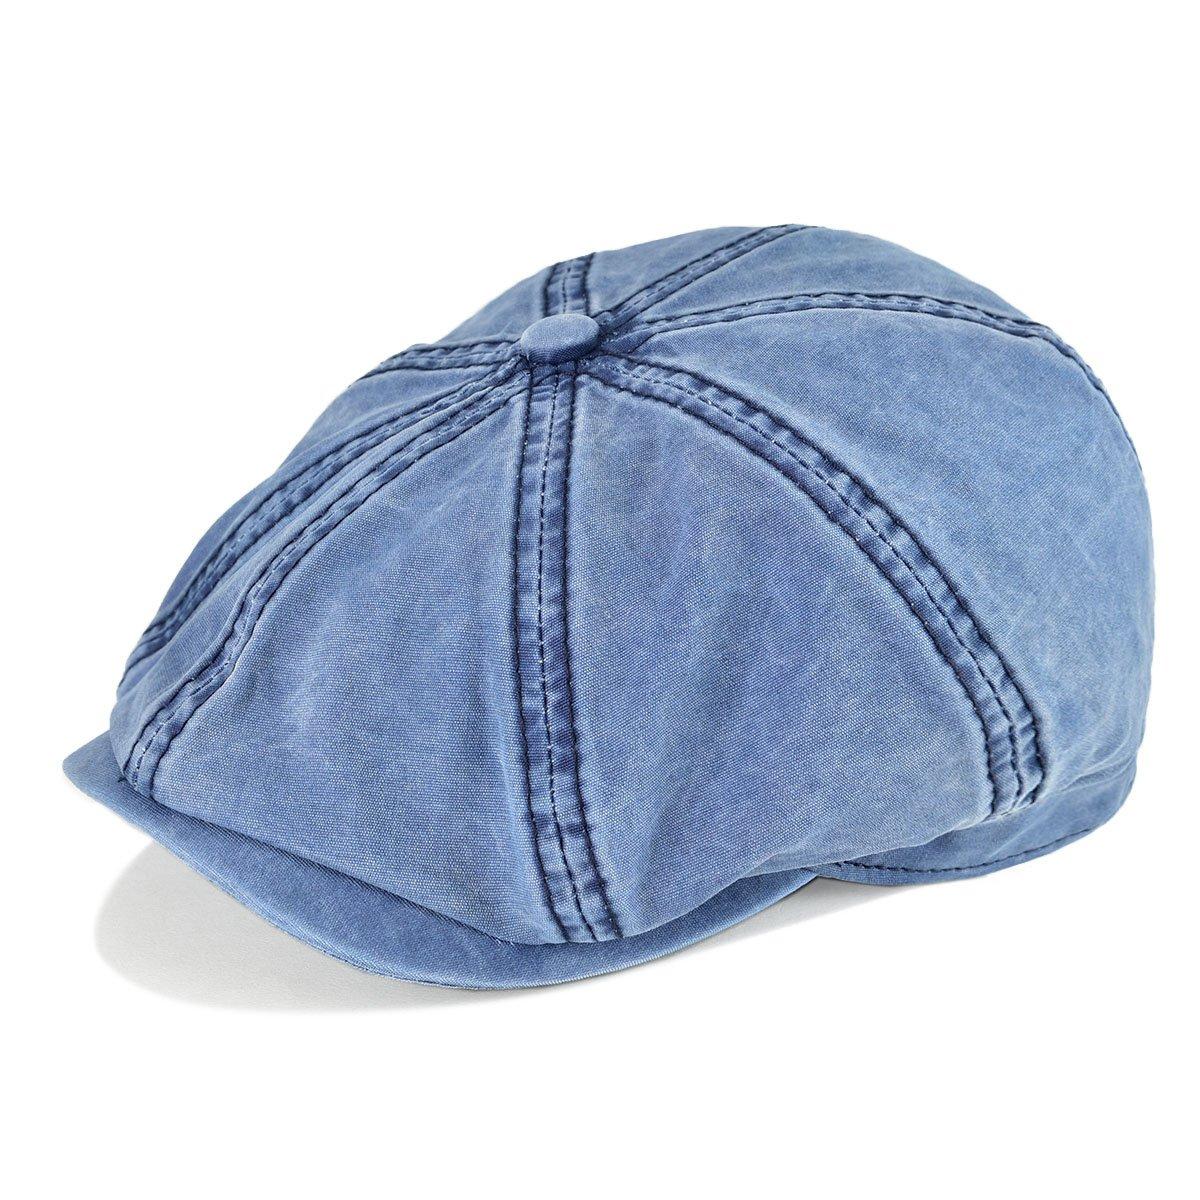 b5199acfe VOBOOM 100% Washing Cotton Newsboy Caps Classic 8 Pannel Retro ...